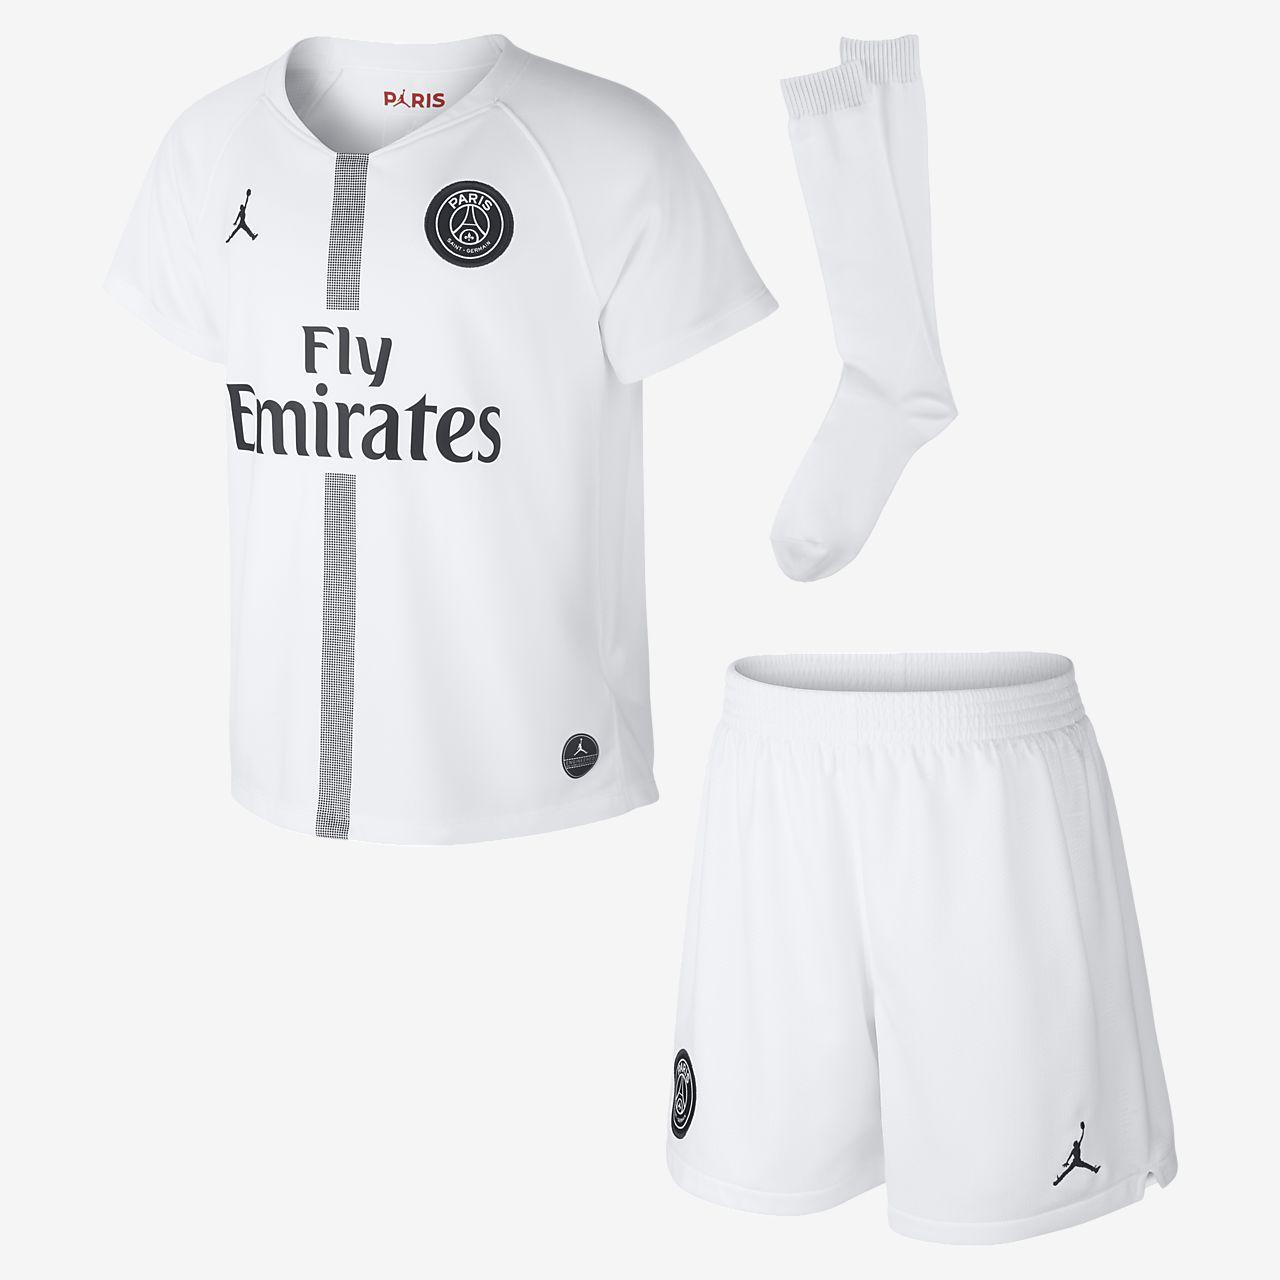 ... Kit de fútbol para niños talla pequeña alternativo Stadium del Paris  Saint-Germain 2018 d6415f2bf44a7